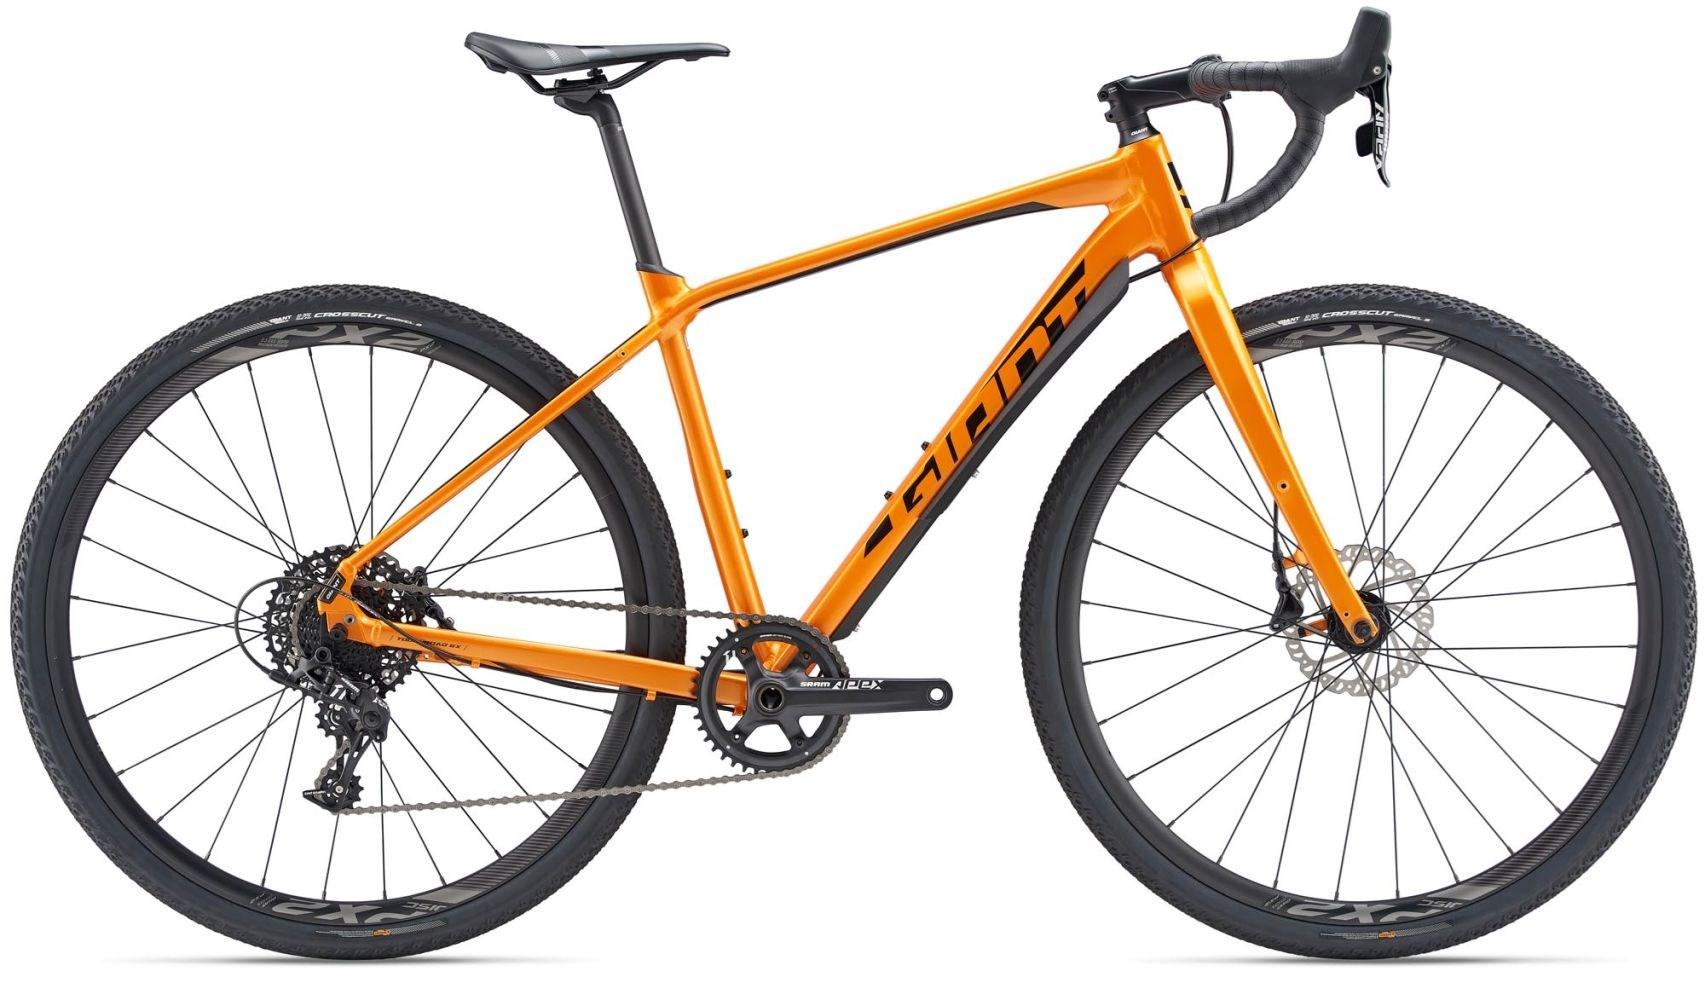 giant toughroad slr gx 0 2019 gravel bike metallic orange. Black Bedroom Furniture Sets. Home Design Ideas